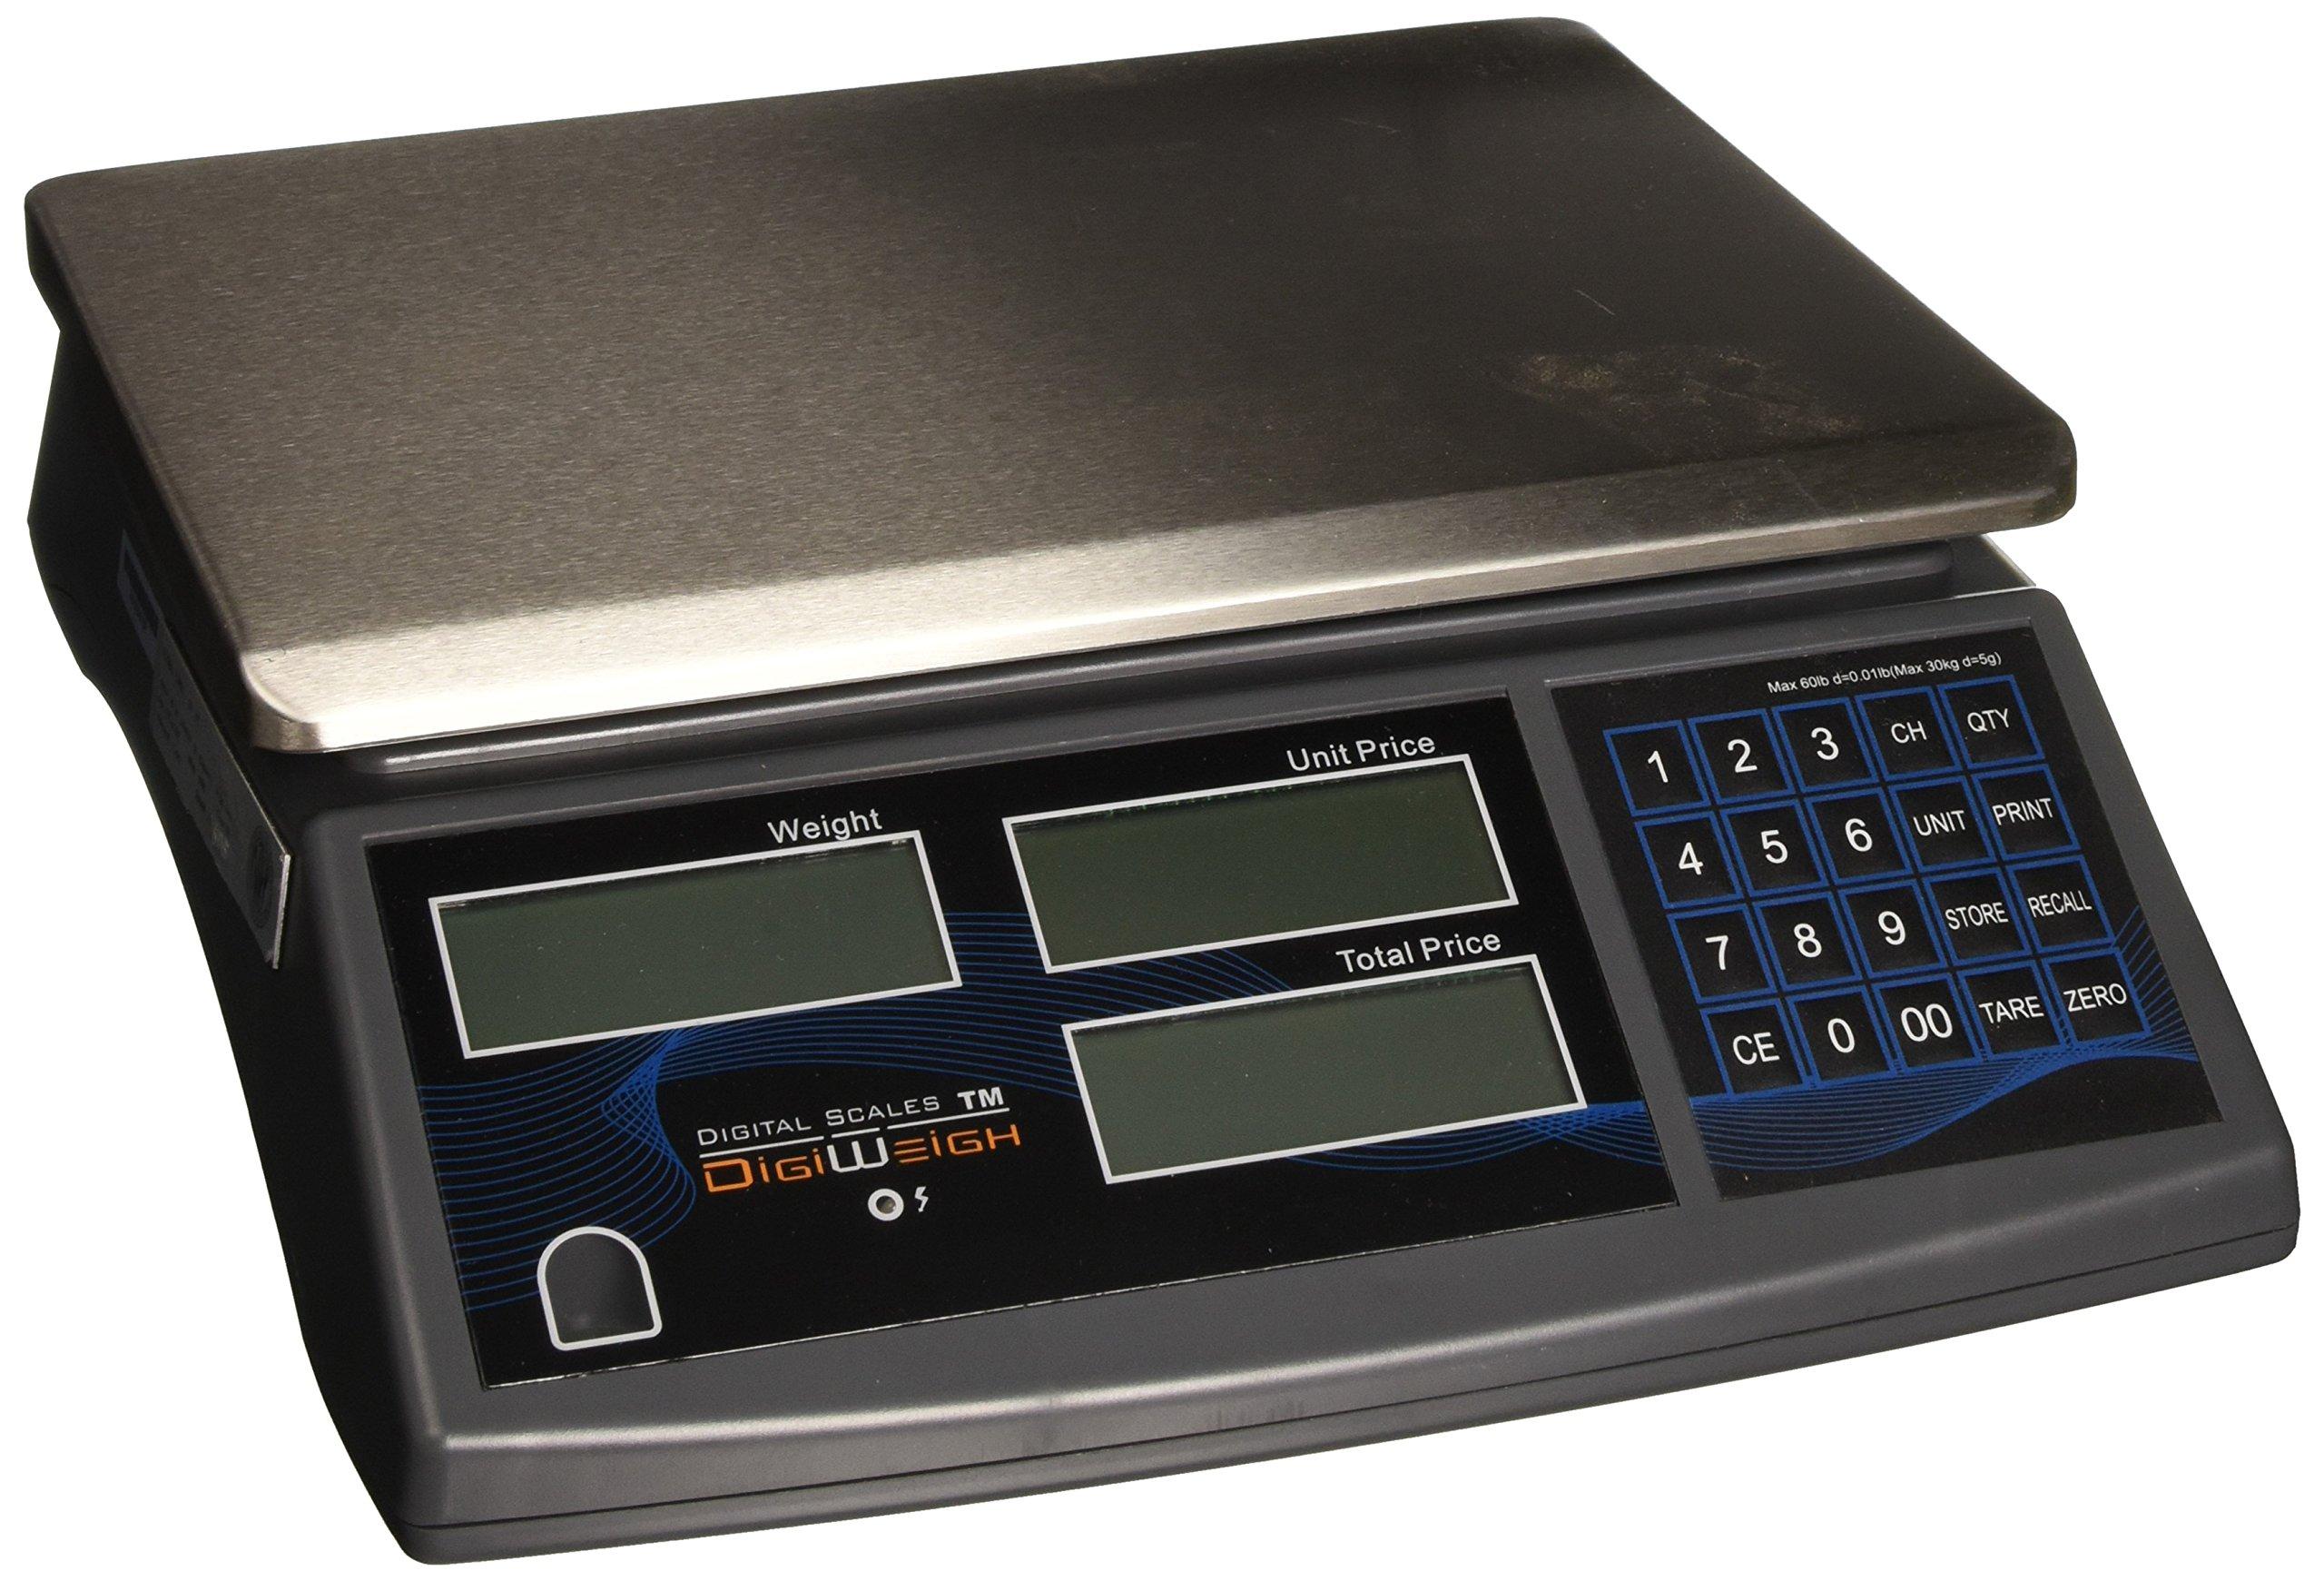 Digiweigh Computing Scale (DWP-60PC)